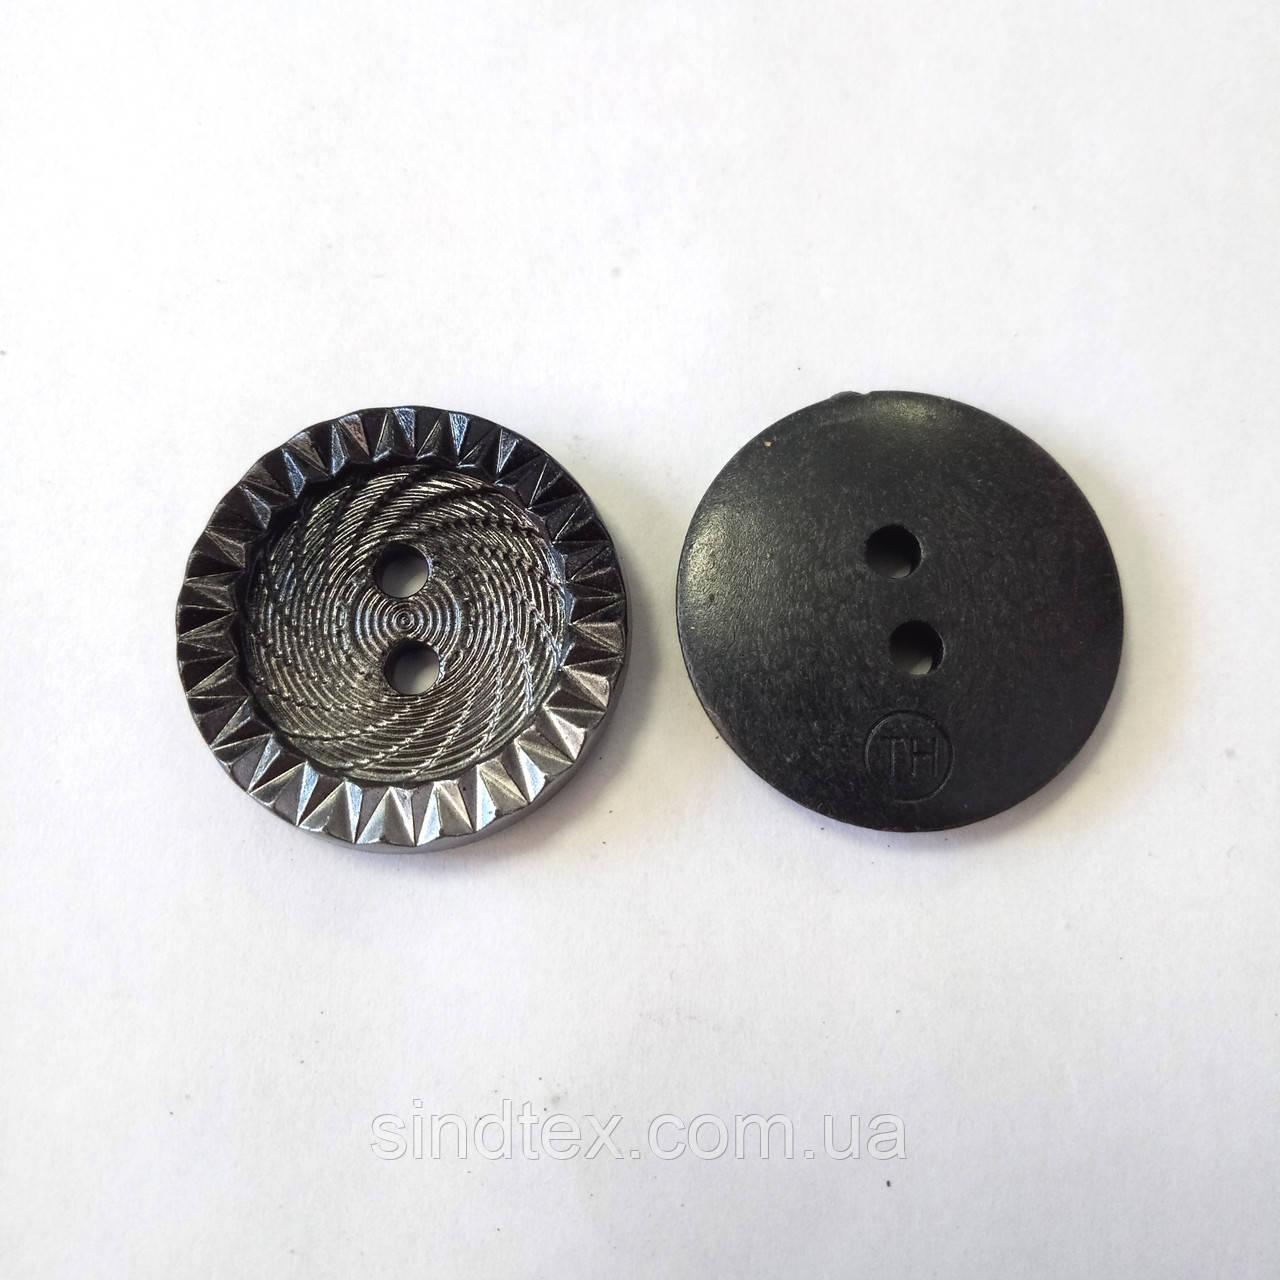 SALE ОПТ от 100шт Пуговица пластик черная 25мм